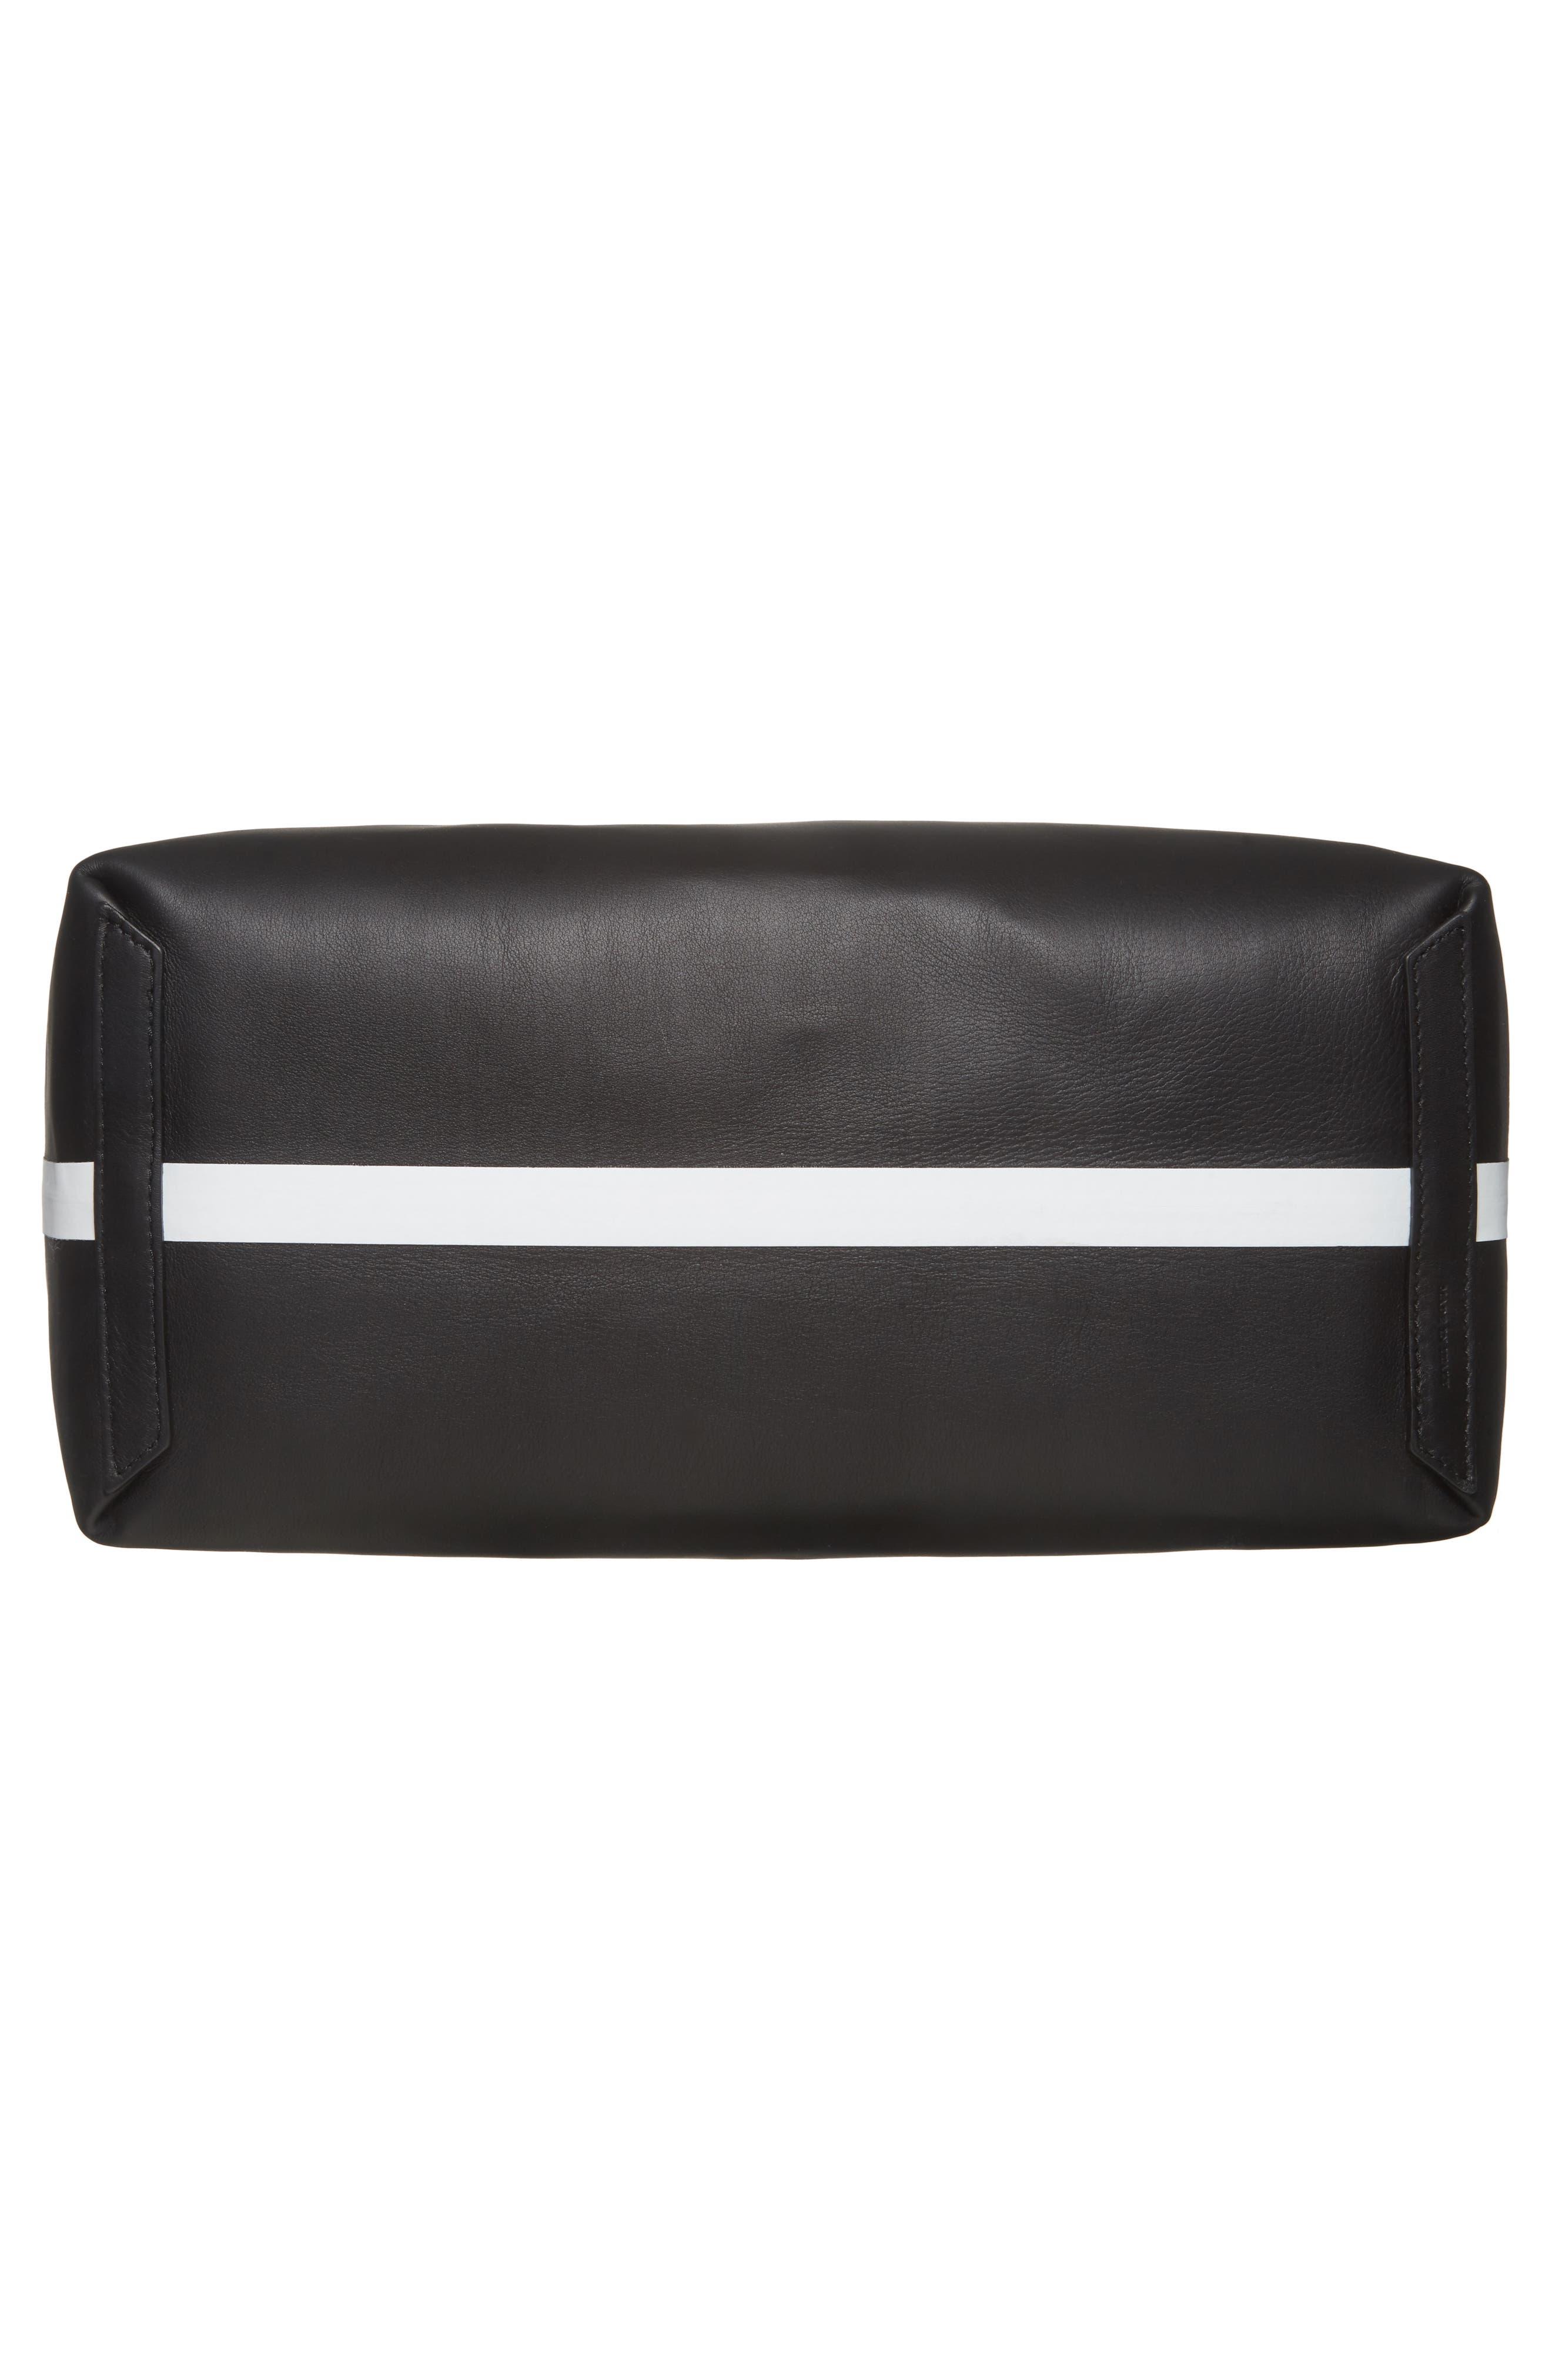 Medium Reversible Leather & Check Canvas Tote,                             Alternate thumbnail 7, color,                             BLACK/ WHITE